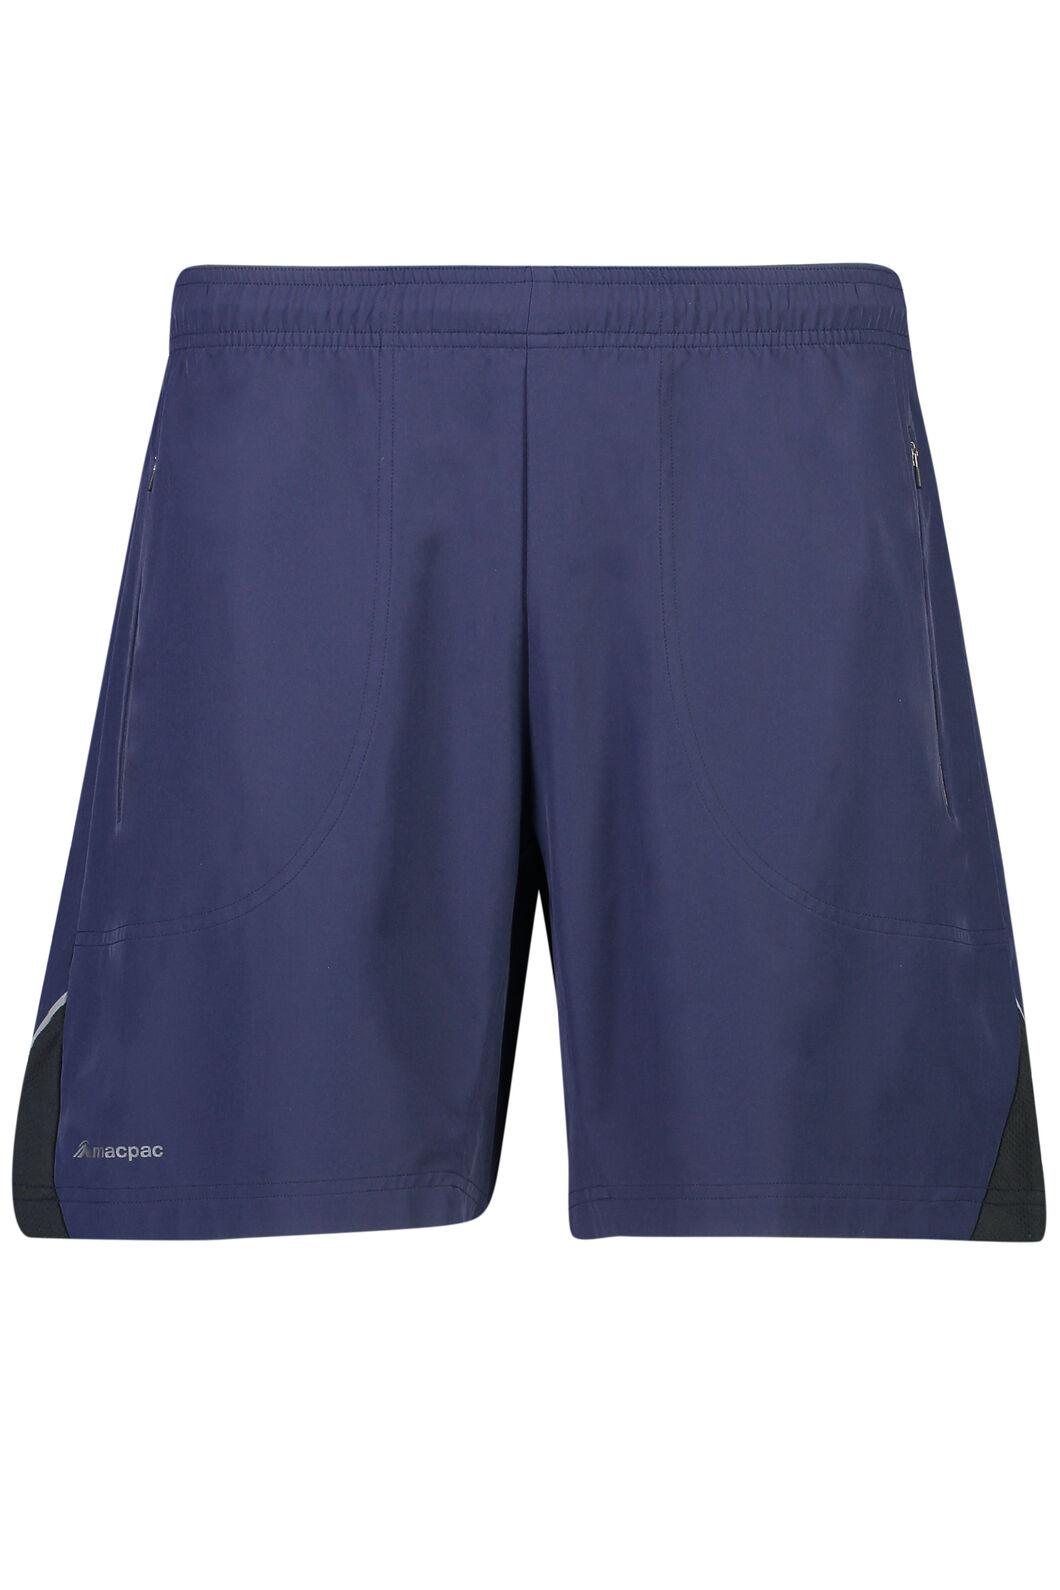 Fast Track Shorts - Men's, Black Iris, hi-res